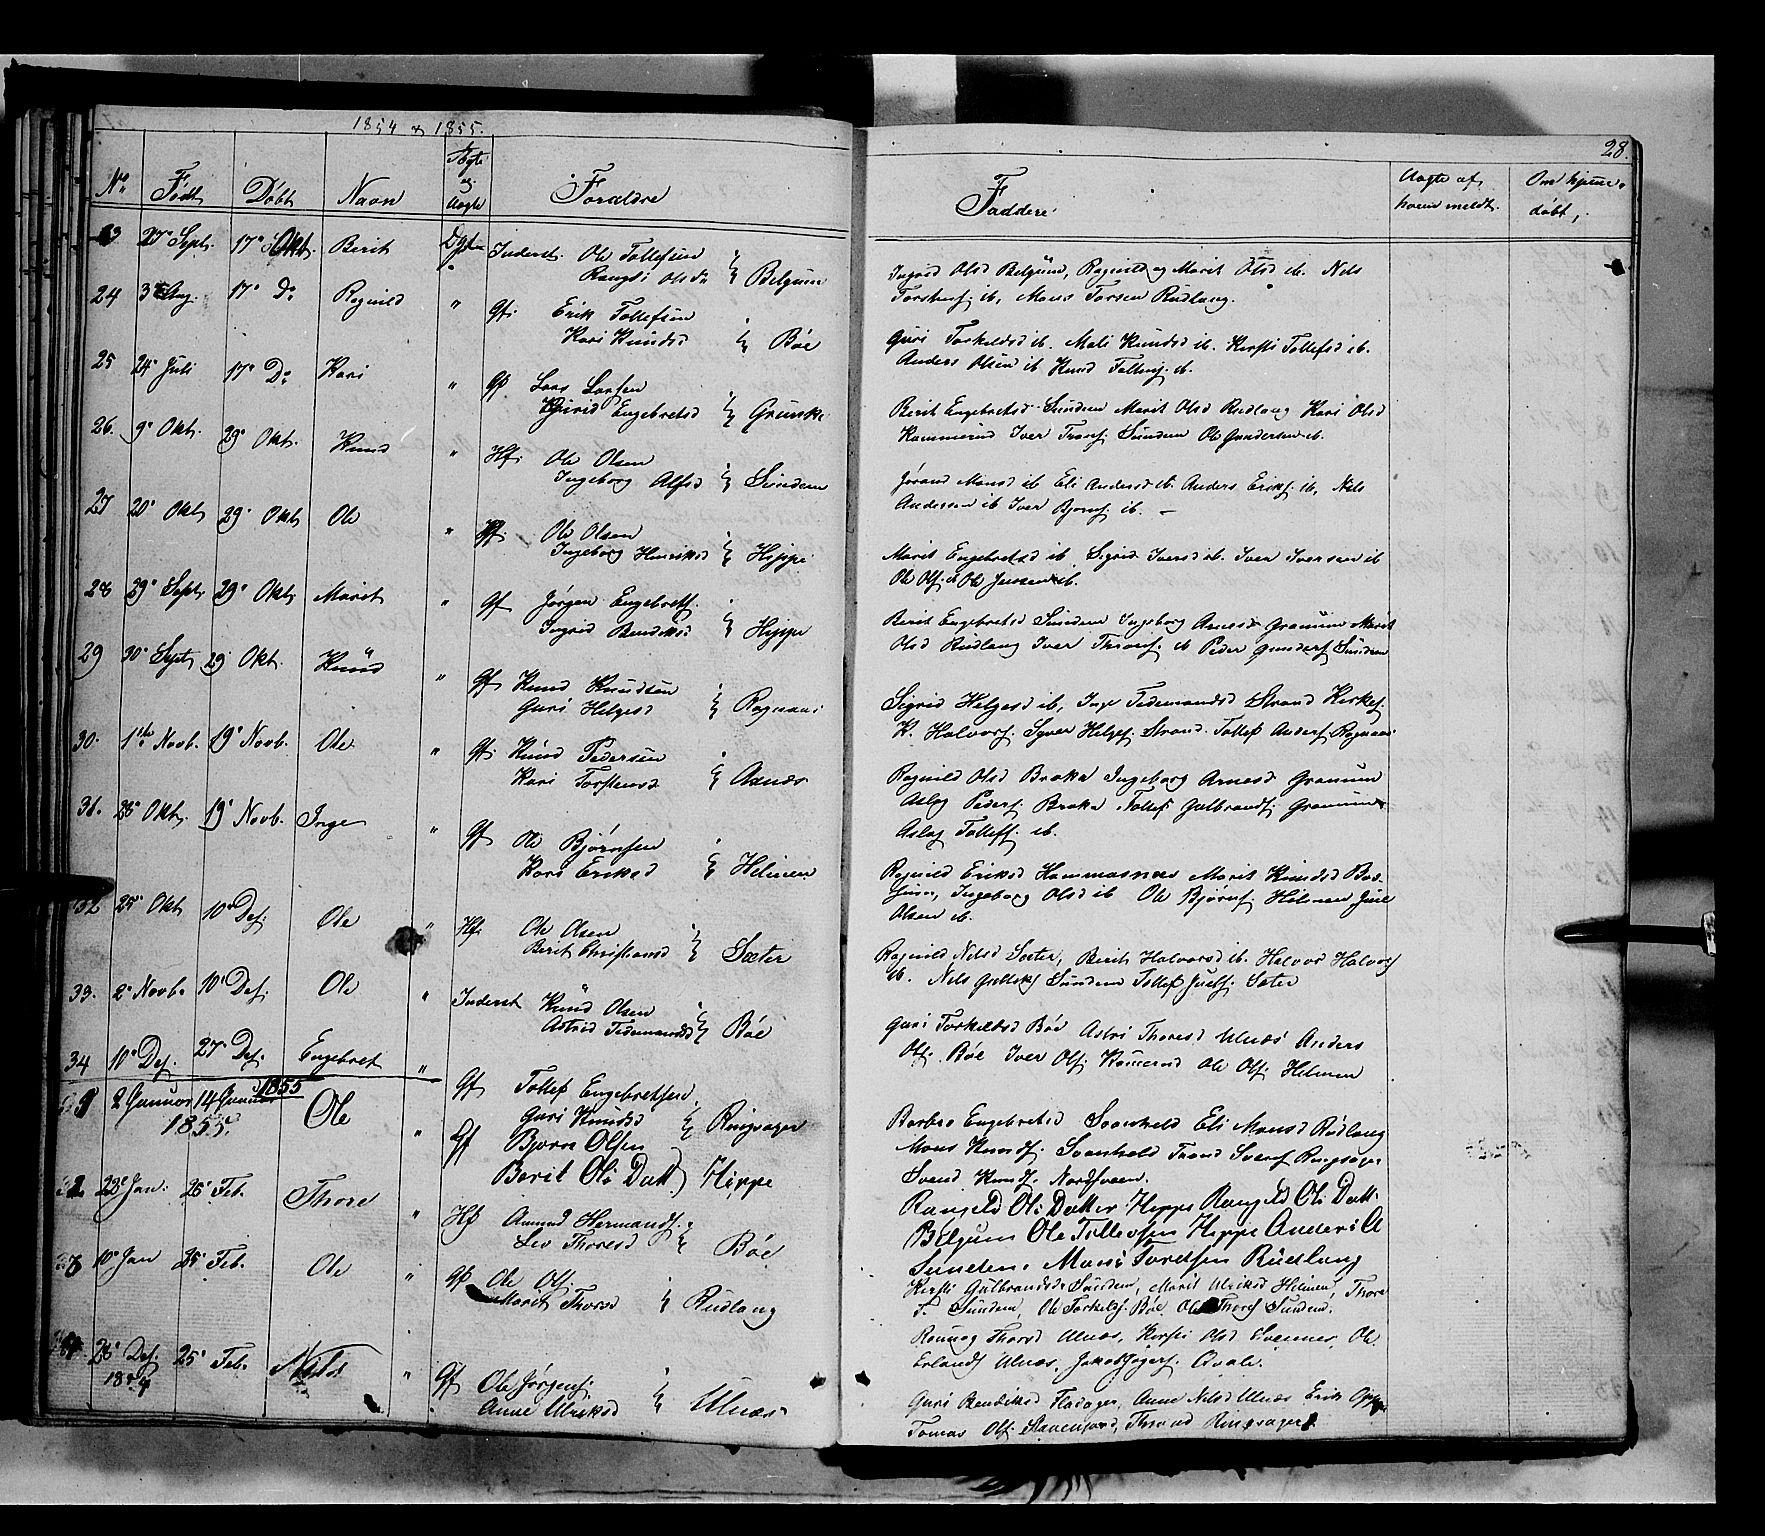 SAH, Nord-Aurdal prestekontor, Ministerialbok nr. 6, 1842-1863, s. 28